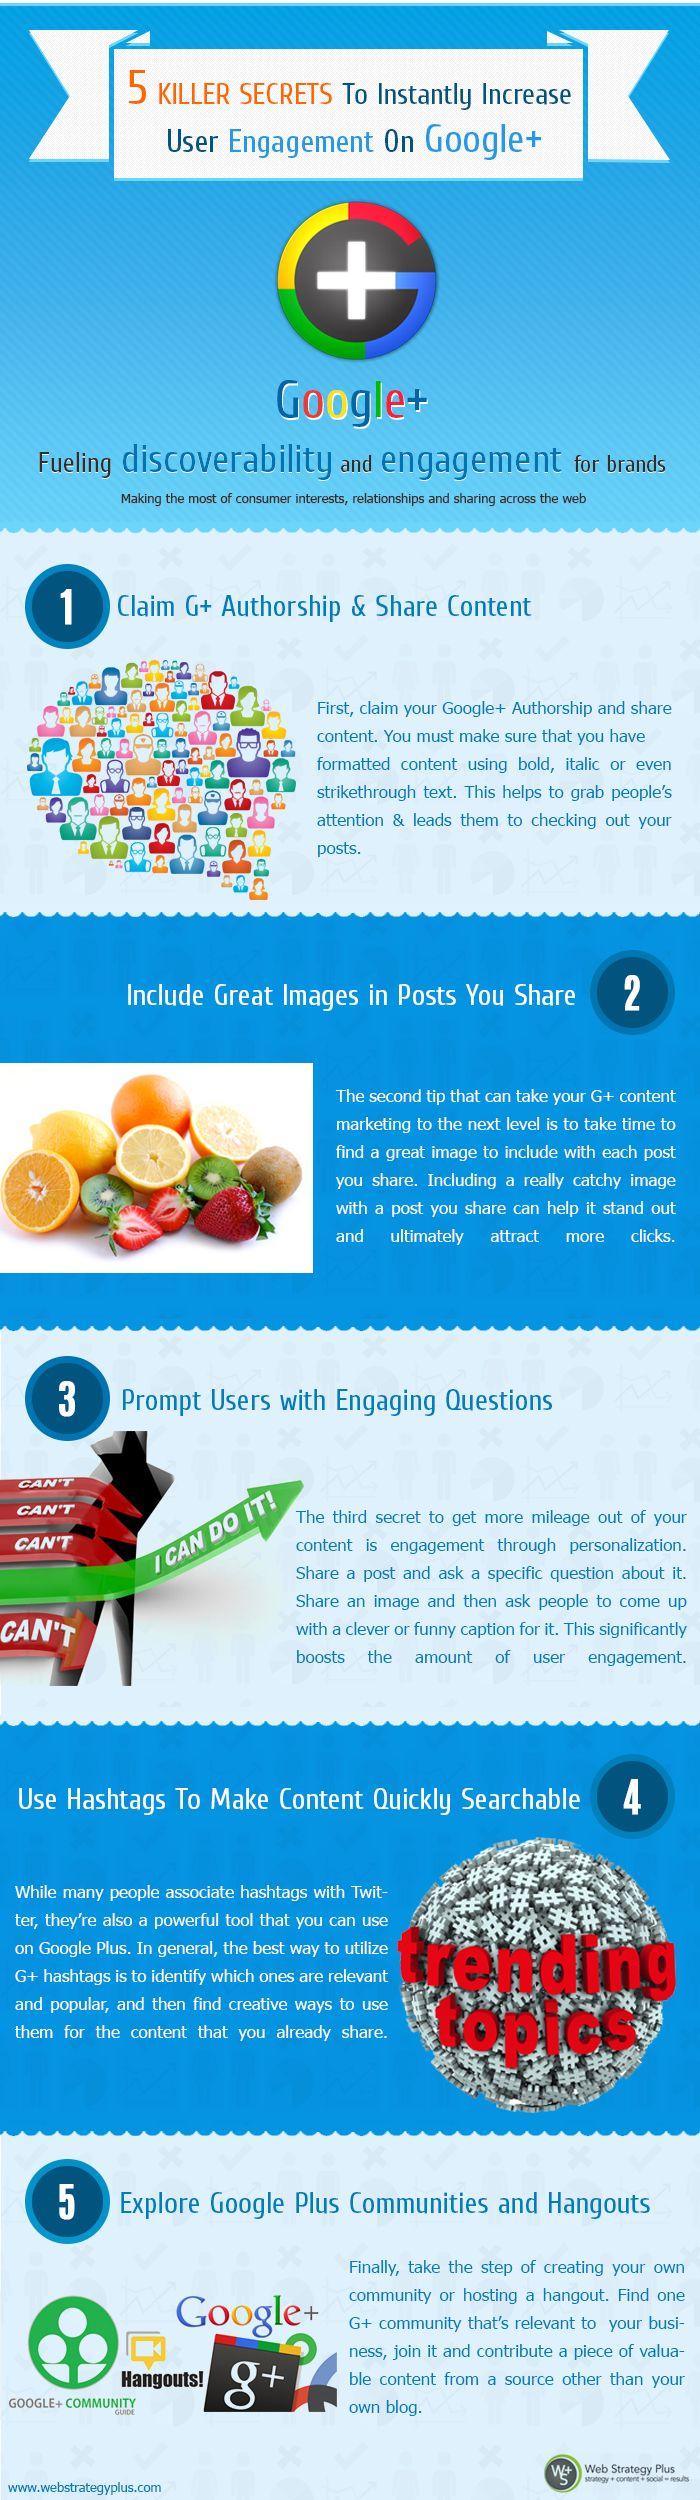 5 Killer Secrets To Instantly Increase User Engagement On Google+ - #SocialMedia #Infographic #GooglePlus